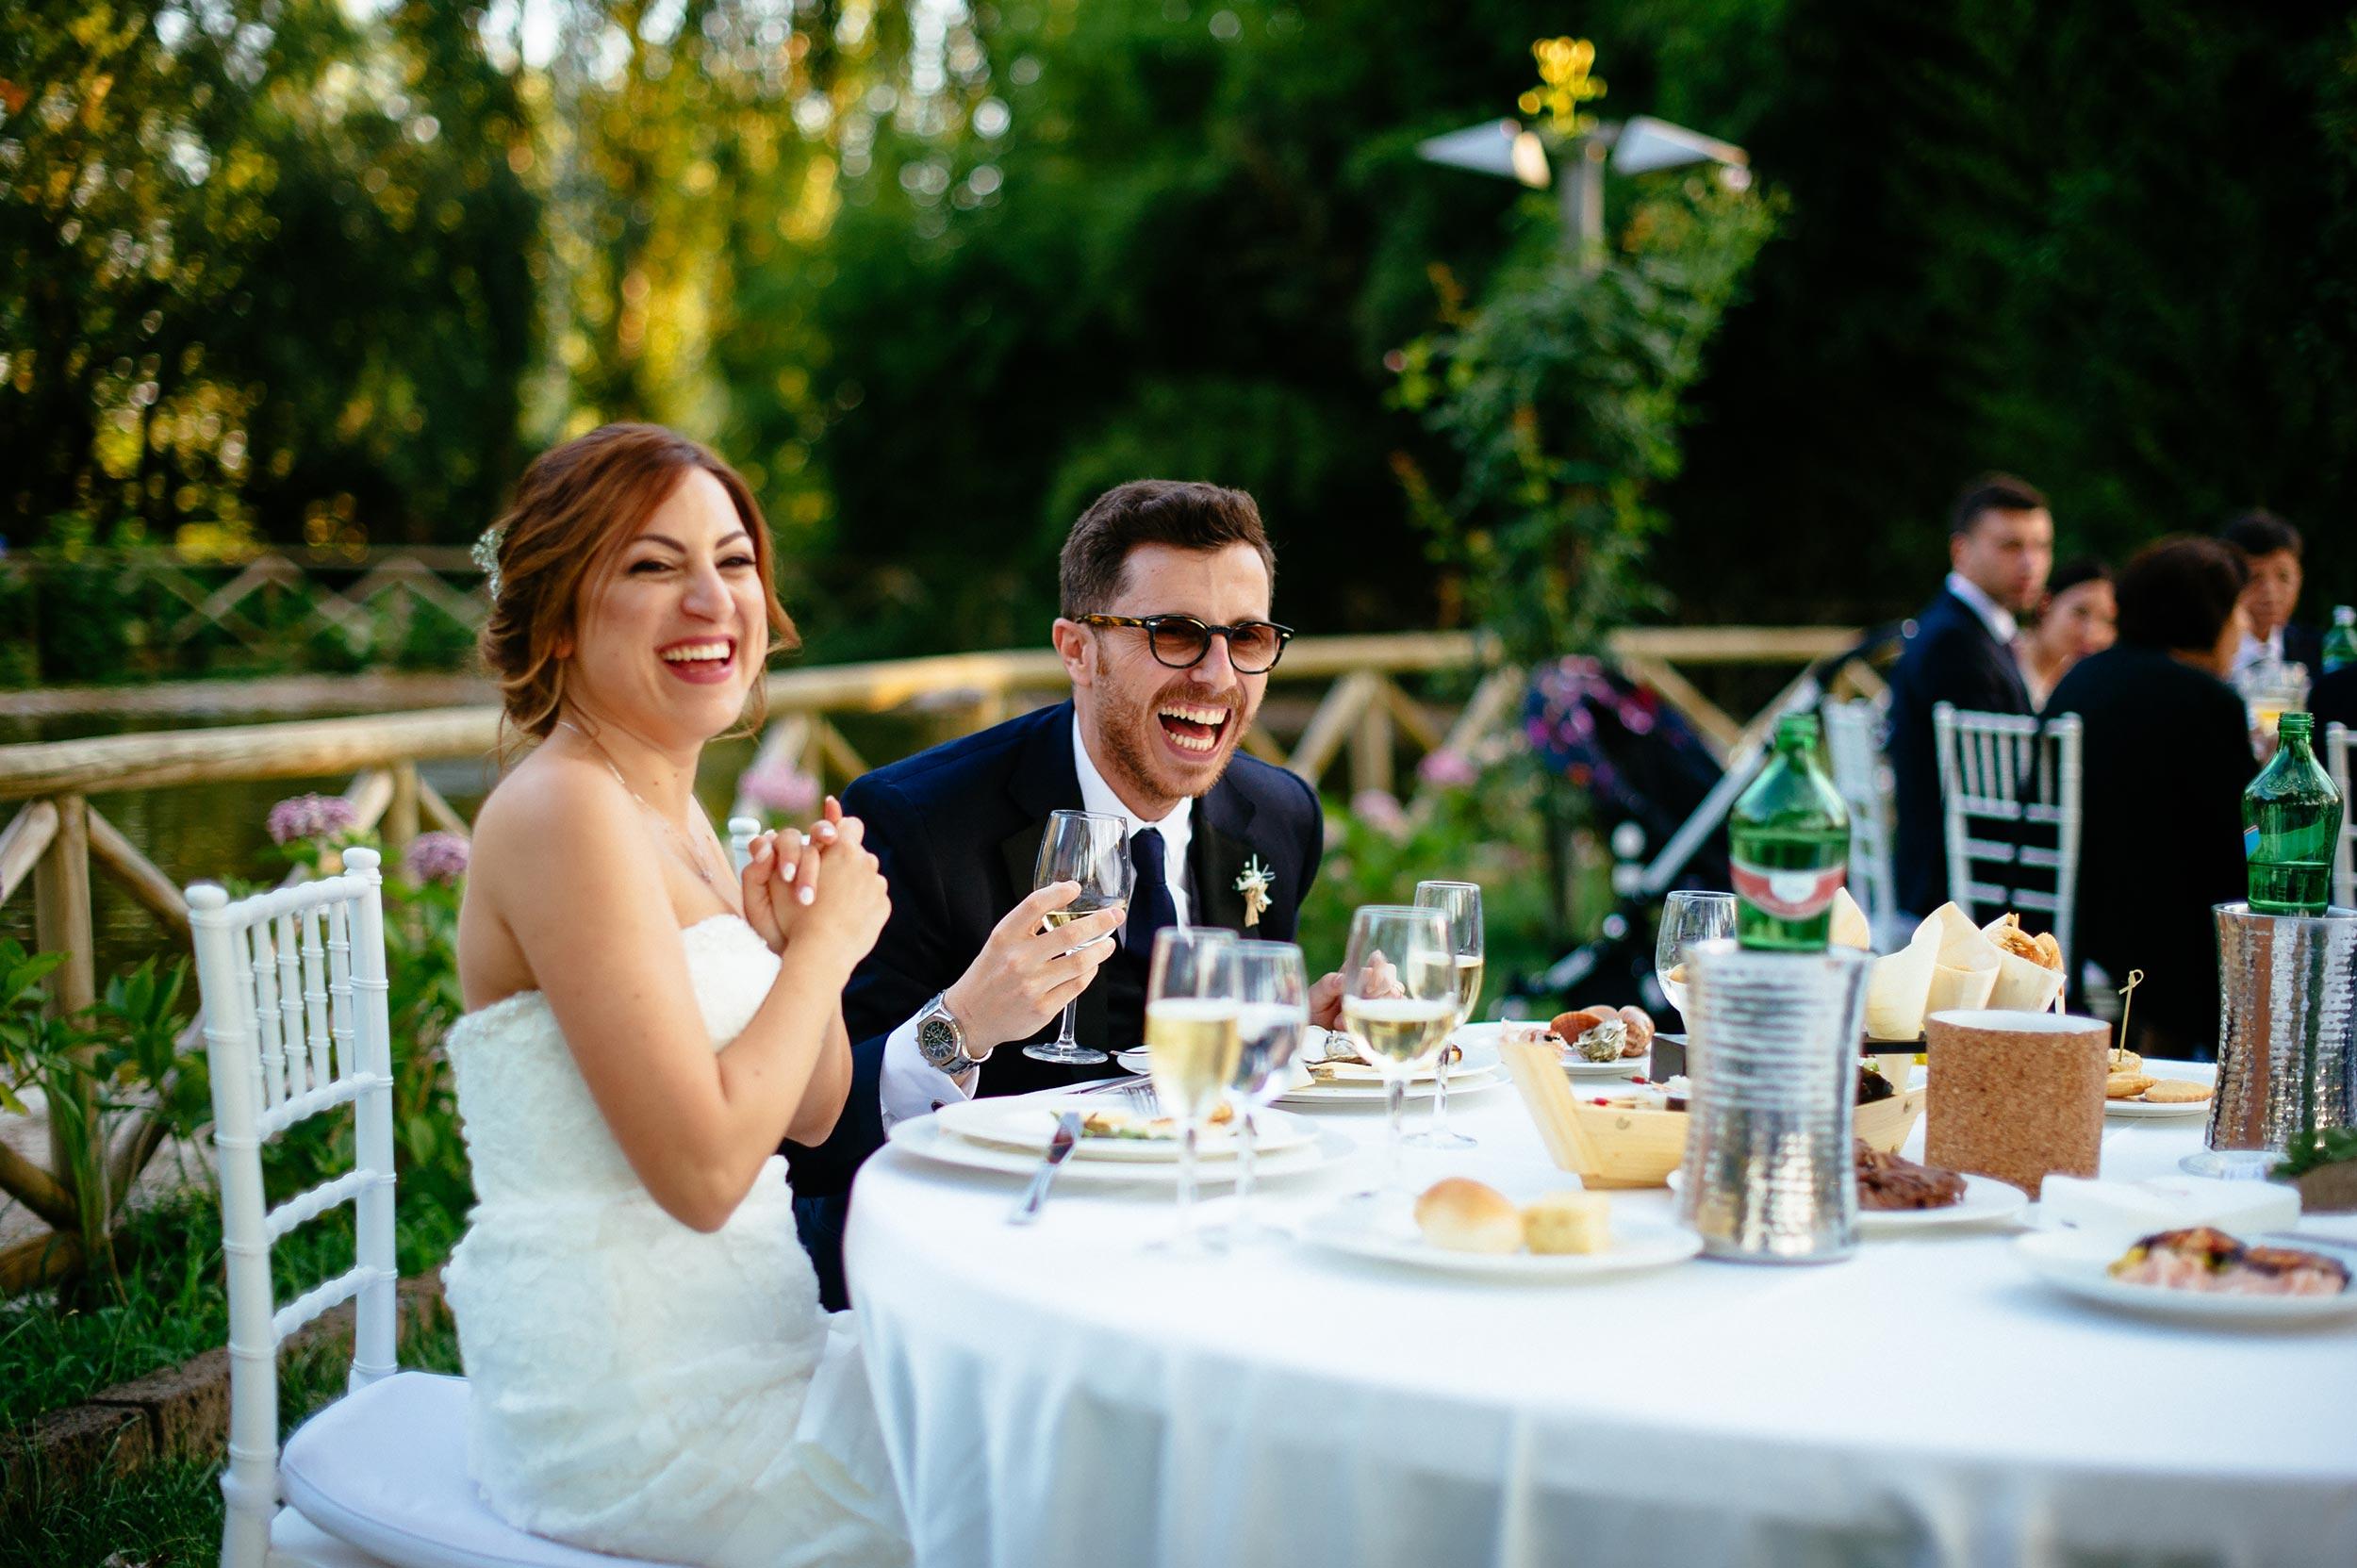 2016-Claudio-Teresa-Naples-Wedding-Photographer-Italy-Alessandro-Avenali-79.jpg